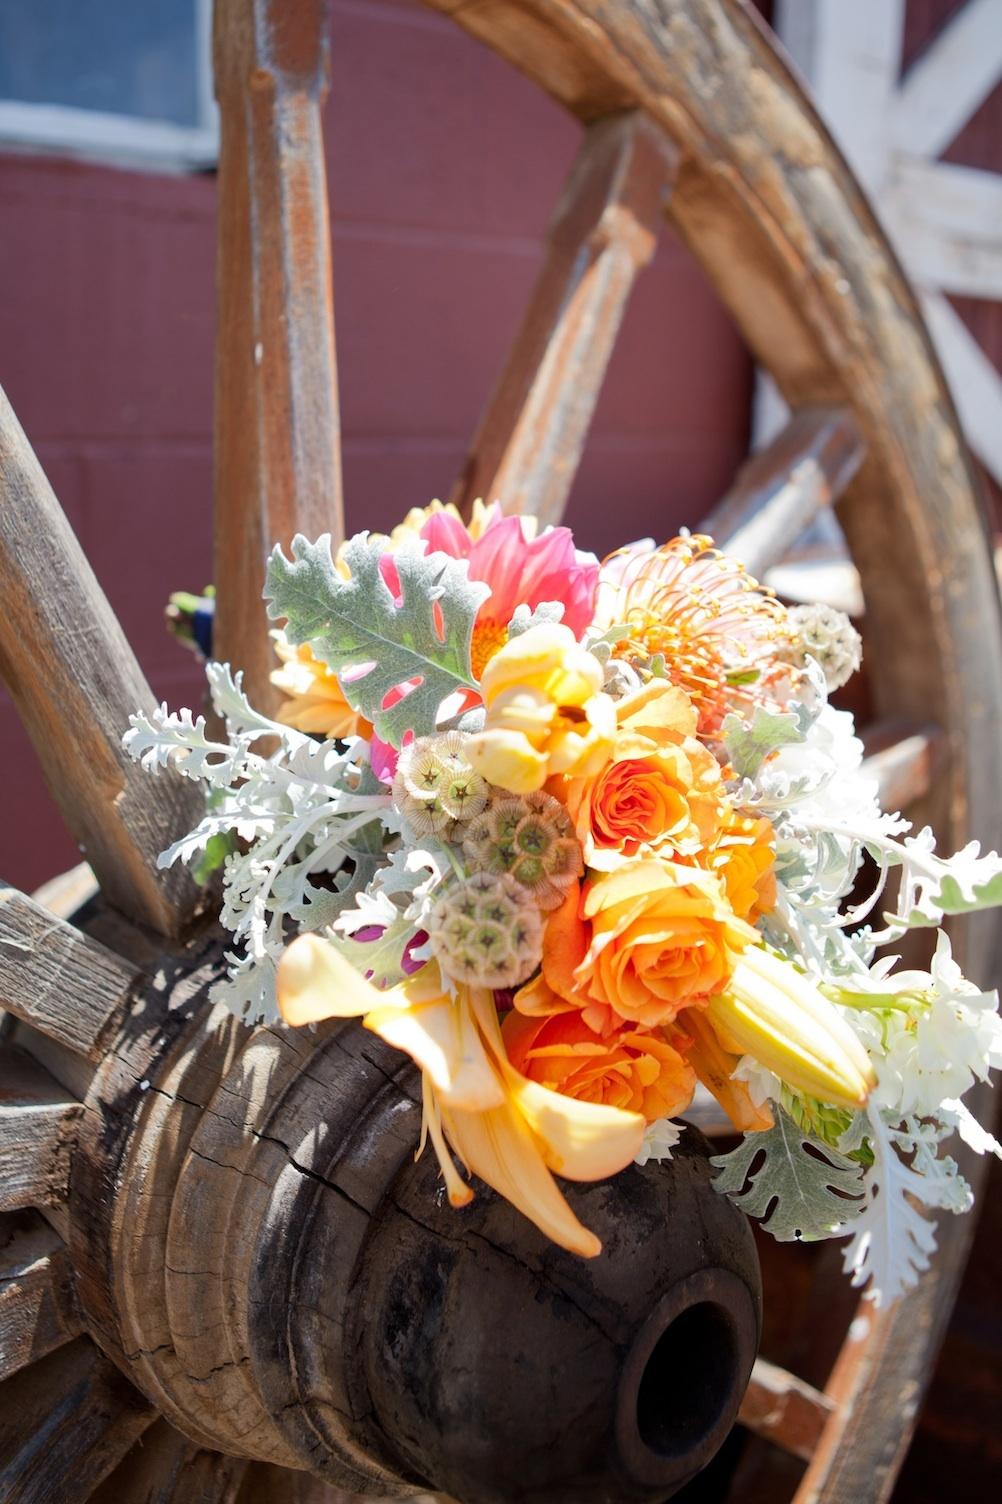 2-kentucky-derby-inspired-wedding-theme-bridal-shower-inspiration-barn-venue-romantic-bouquet.full